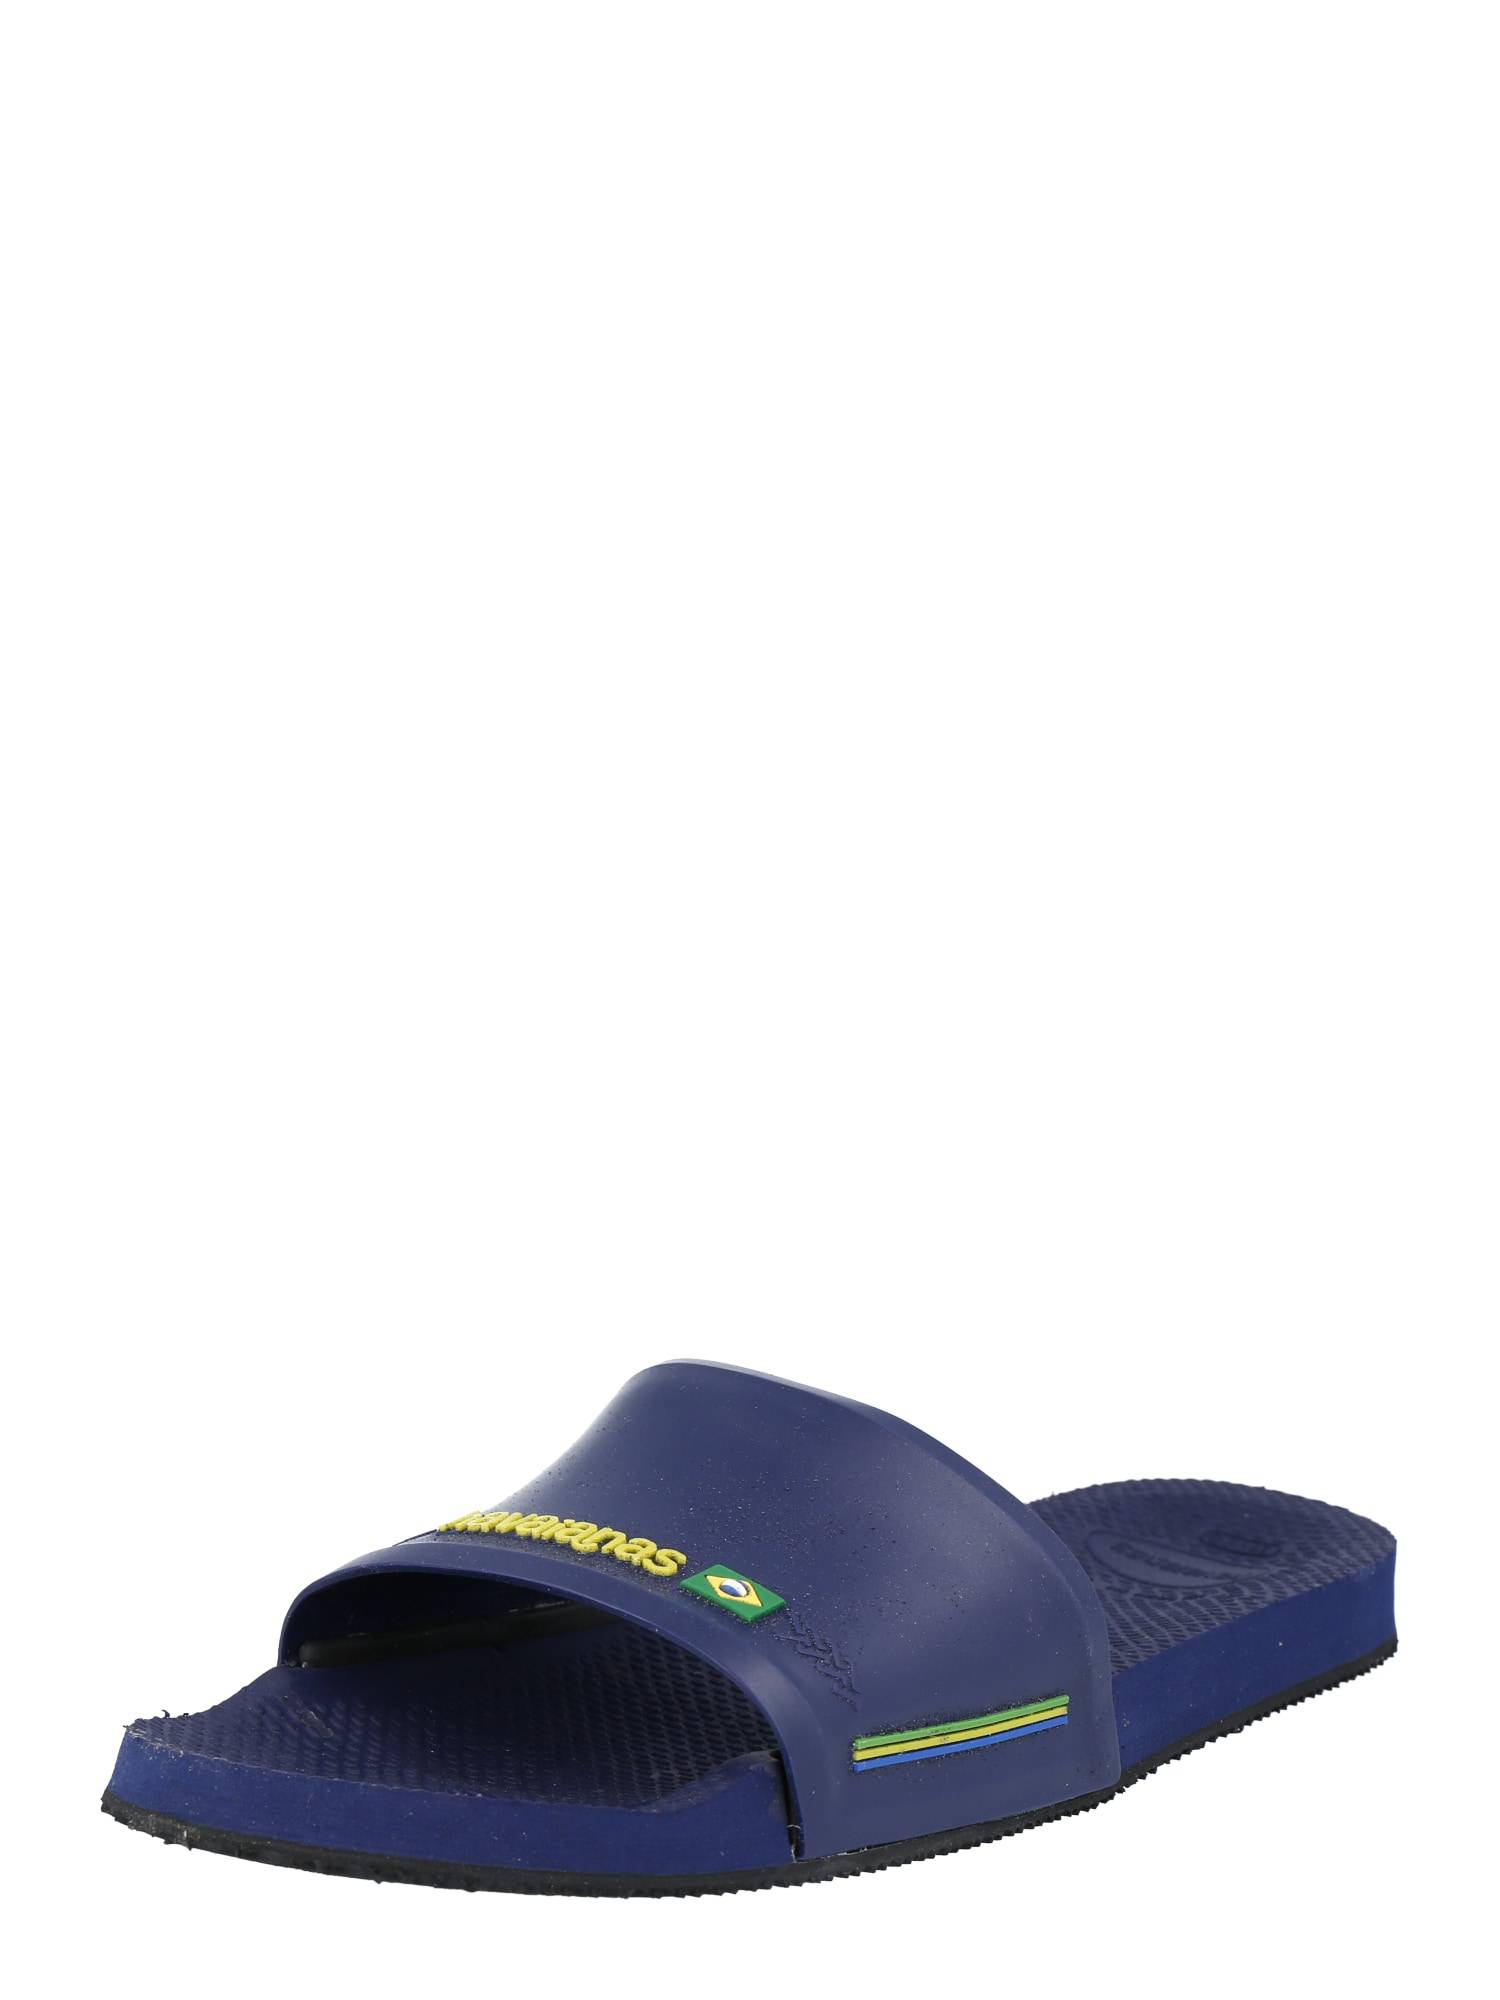 HAVAIANAS Mule 'Slide Brasil'  - Bleu - Taille: 41-42 - male